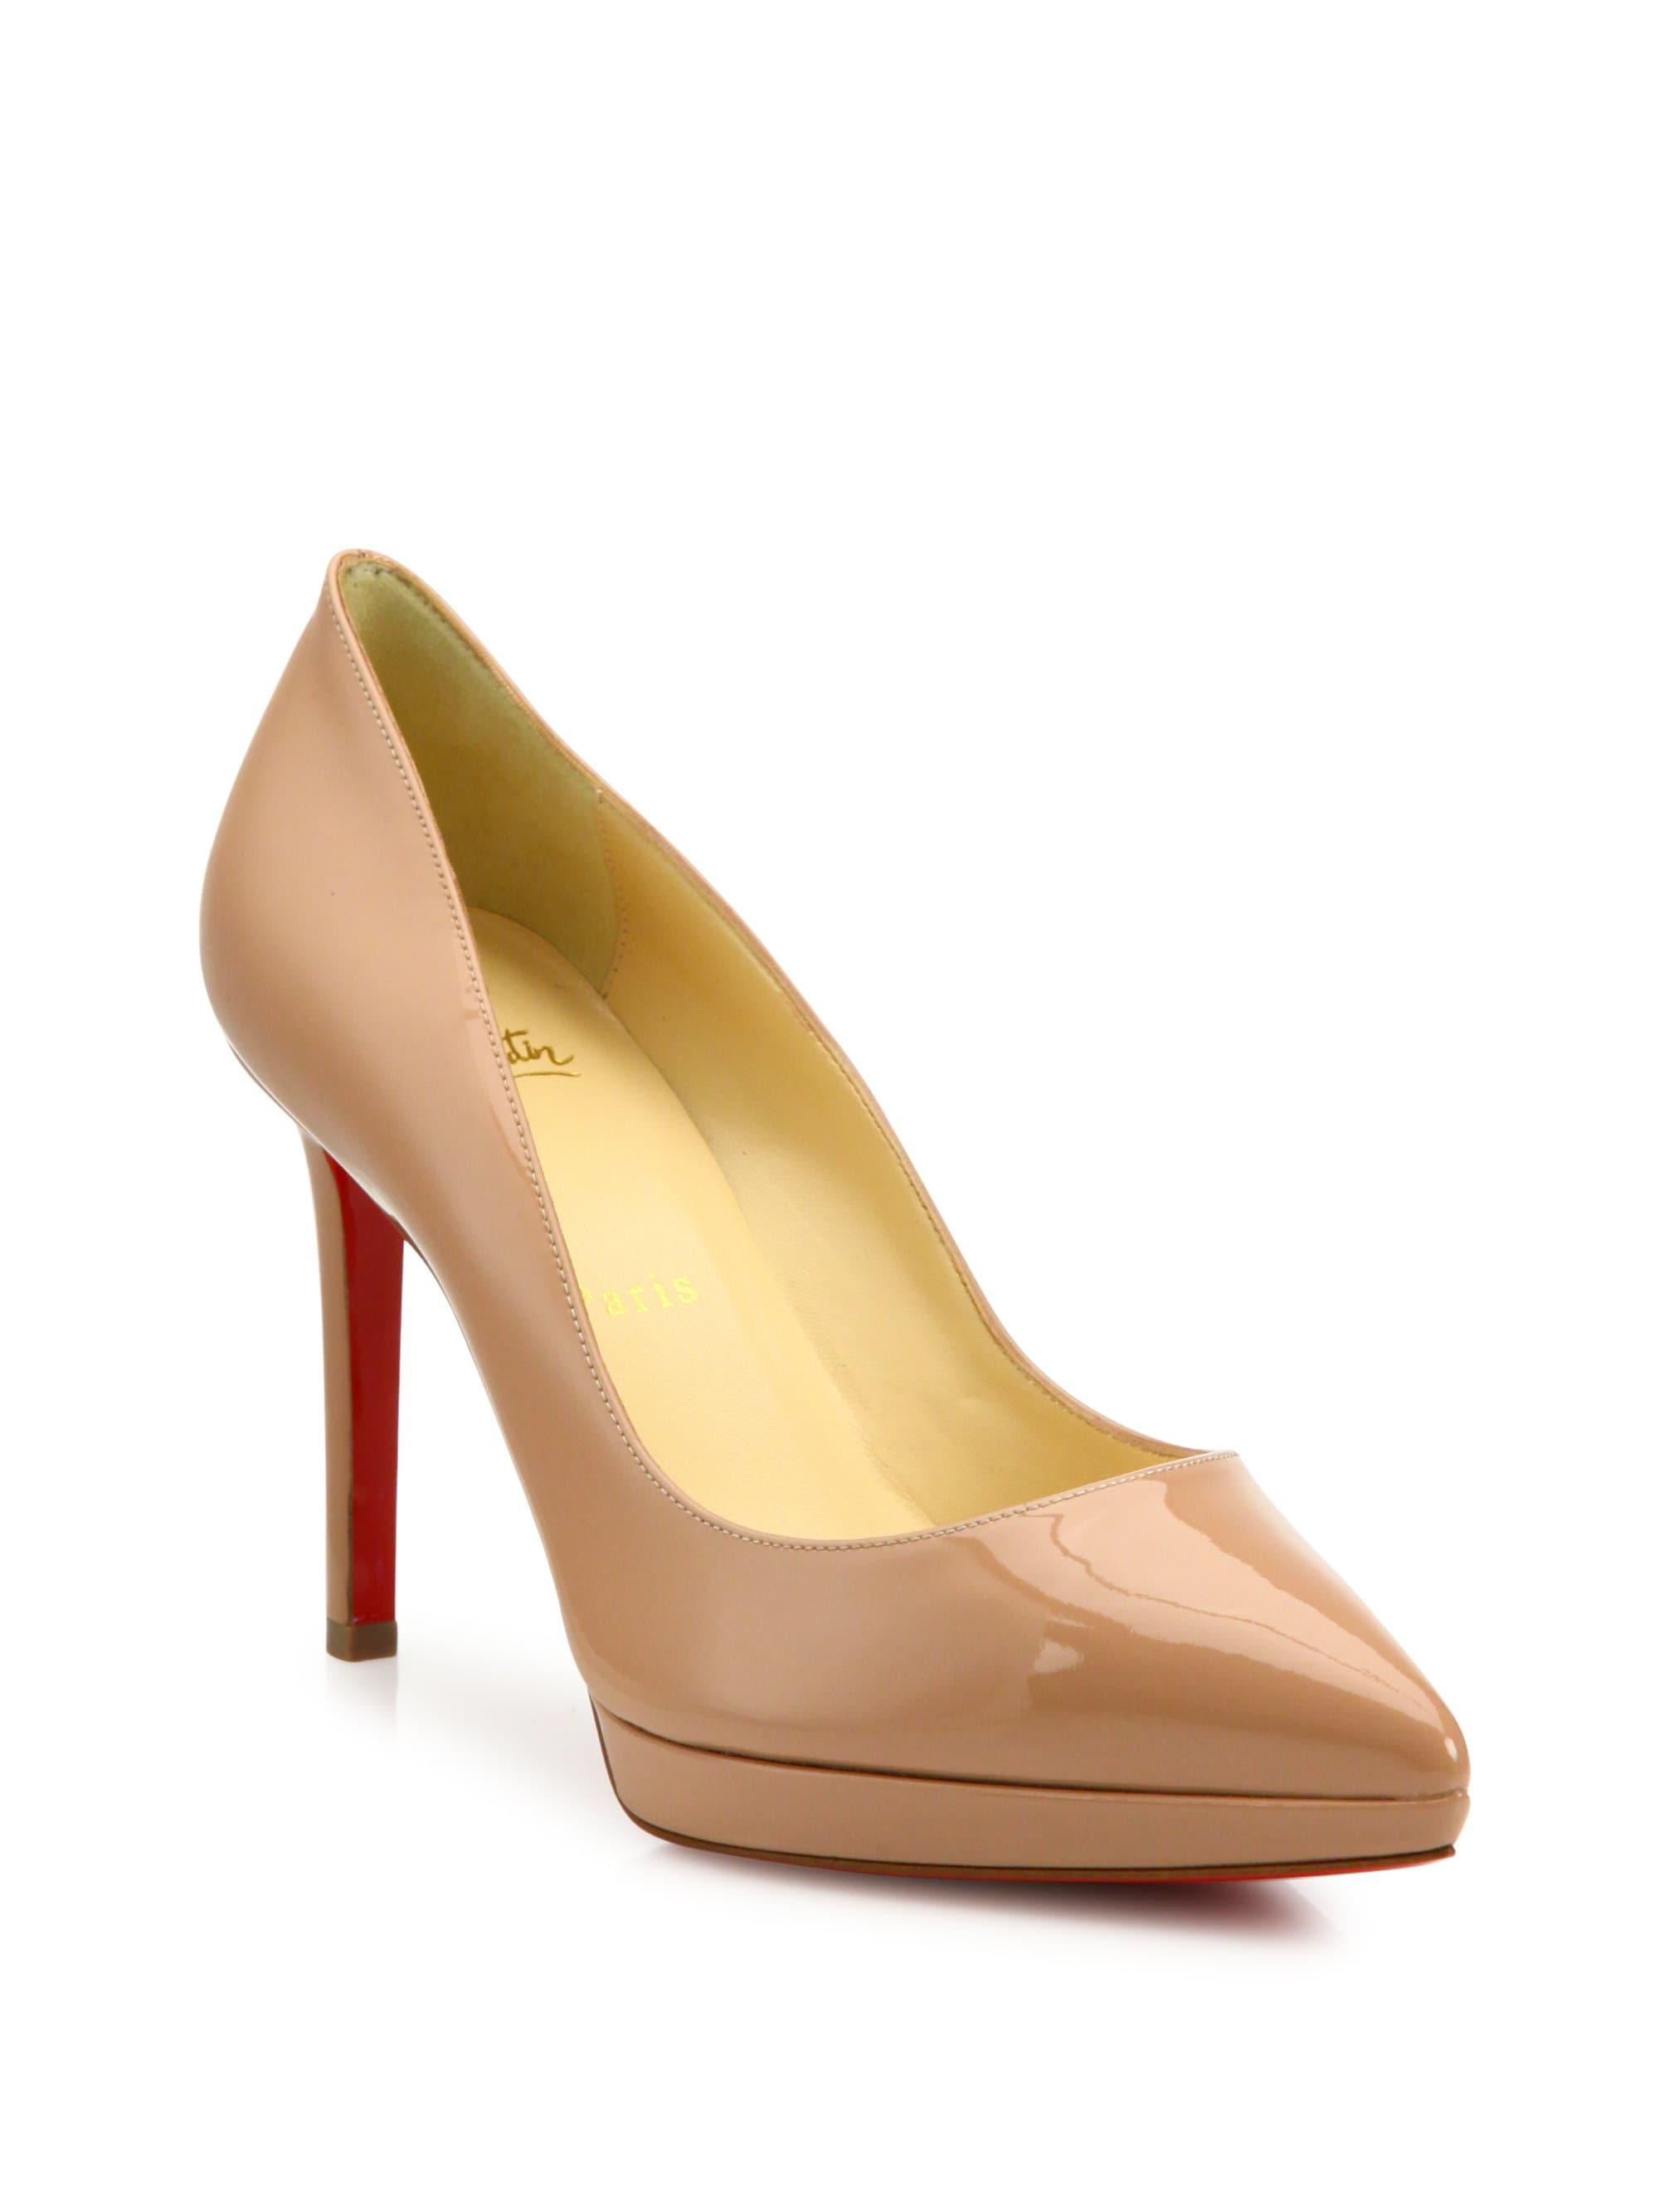 6993a9d60c31 Christian Louboutin. Women s Natural Pigalle 100 Patent Leather Platform  Court Shoes